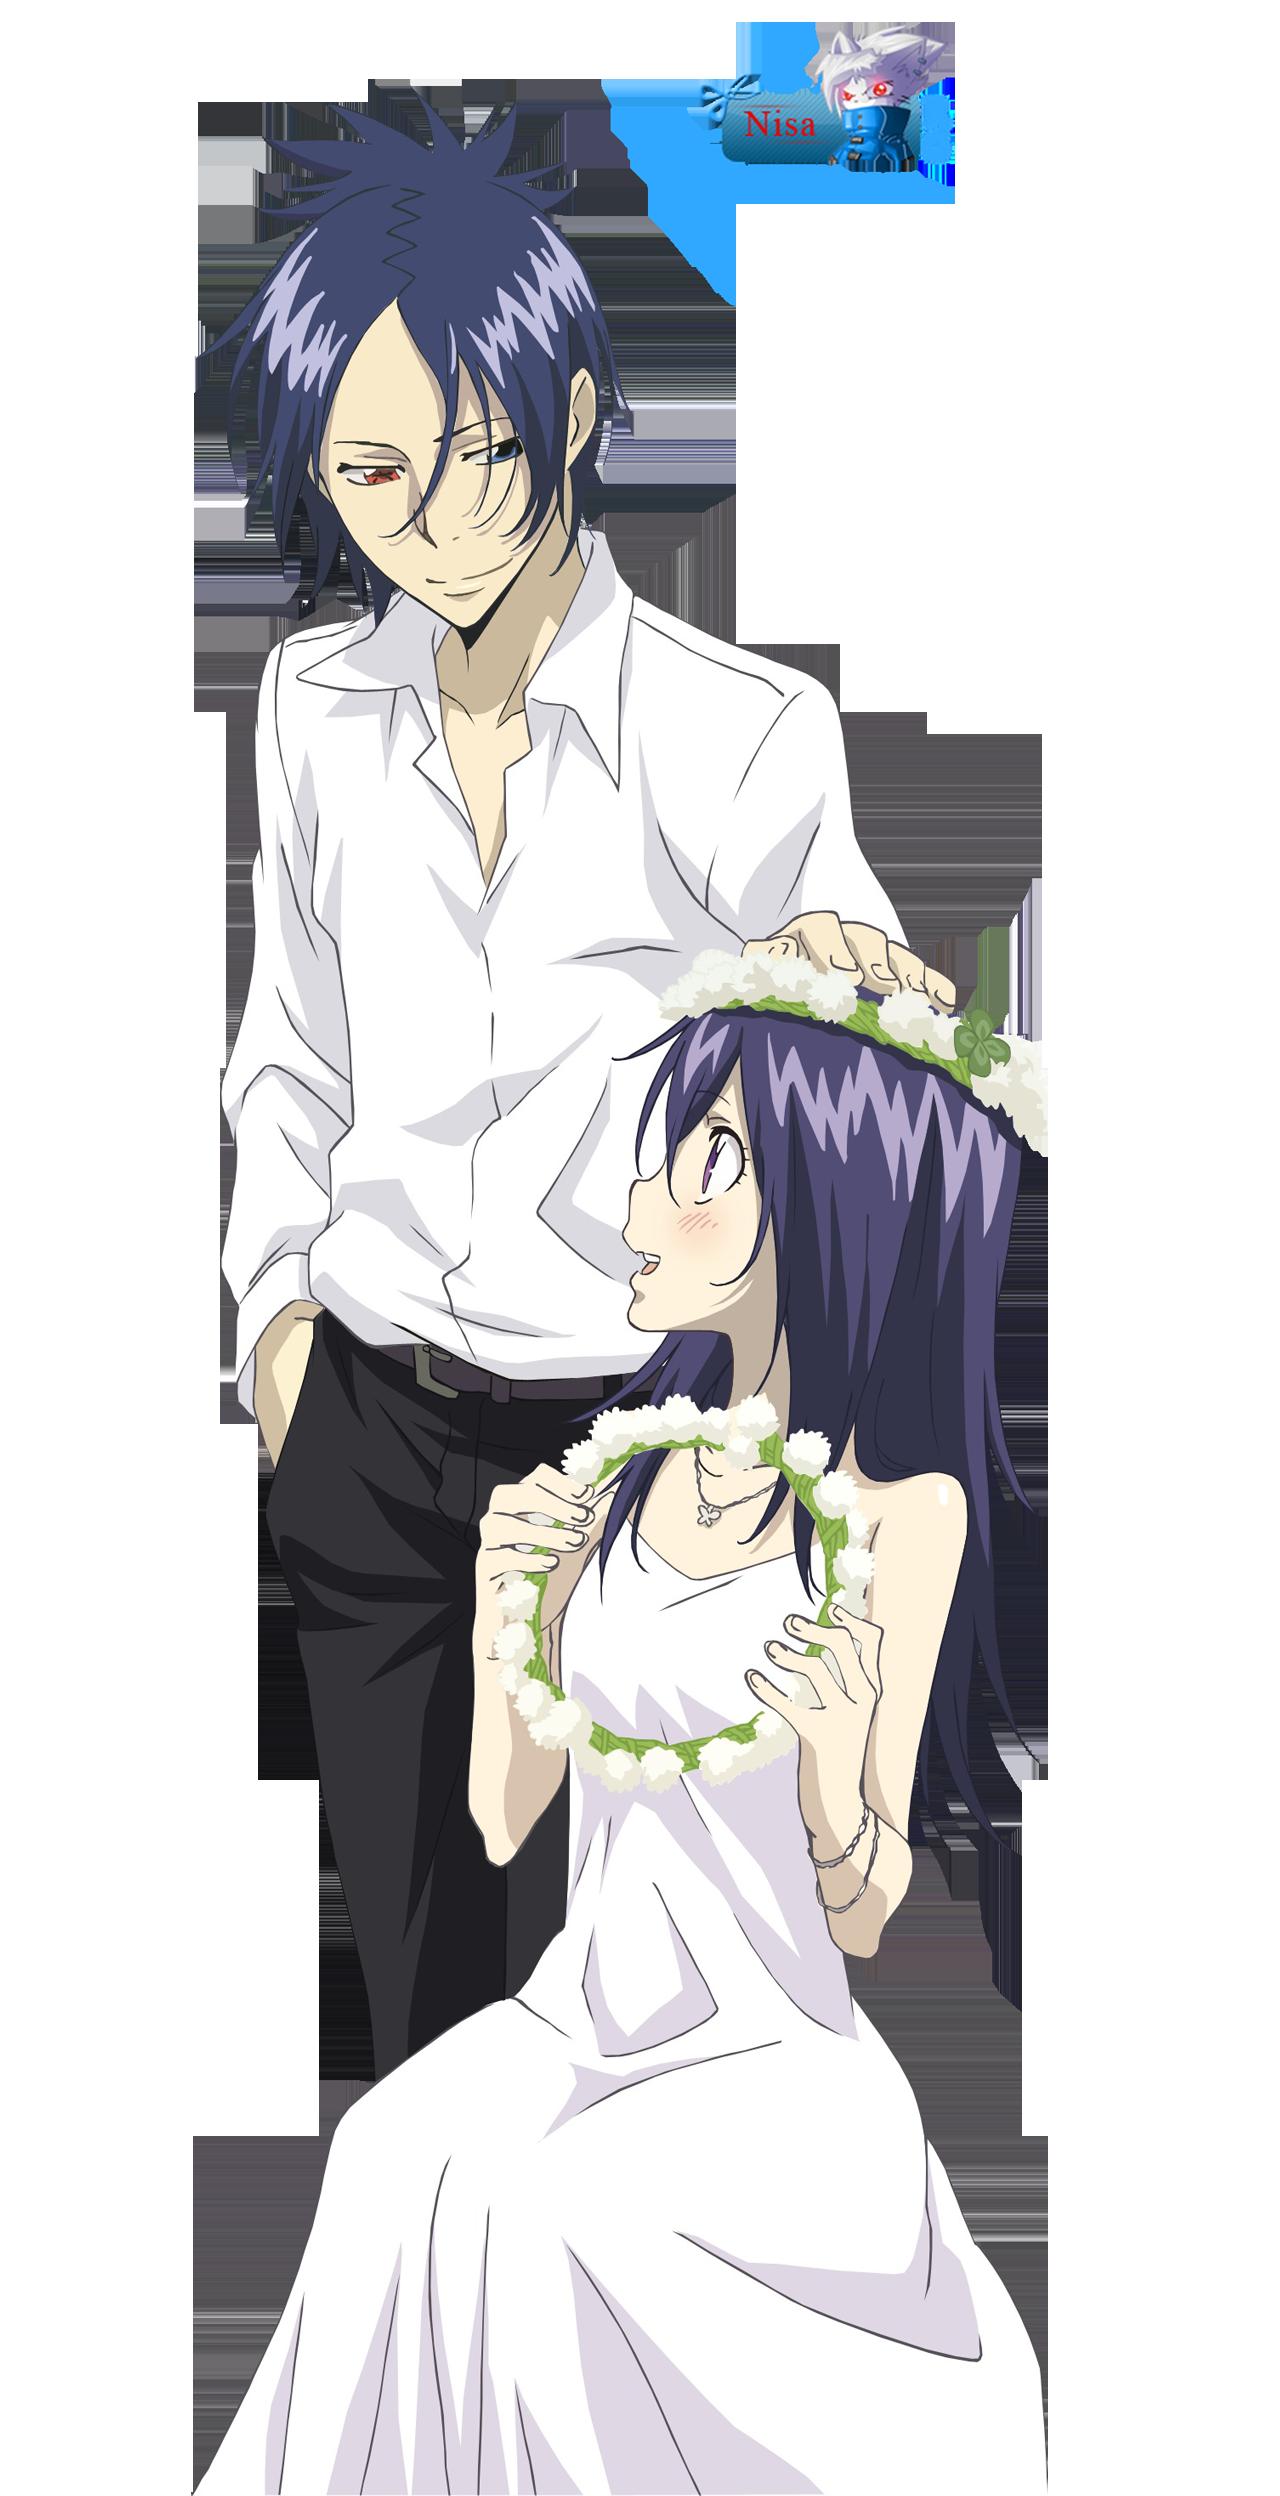 chrome and mukuro animestuff i love to death